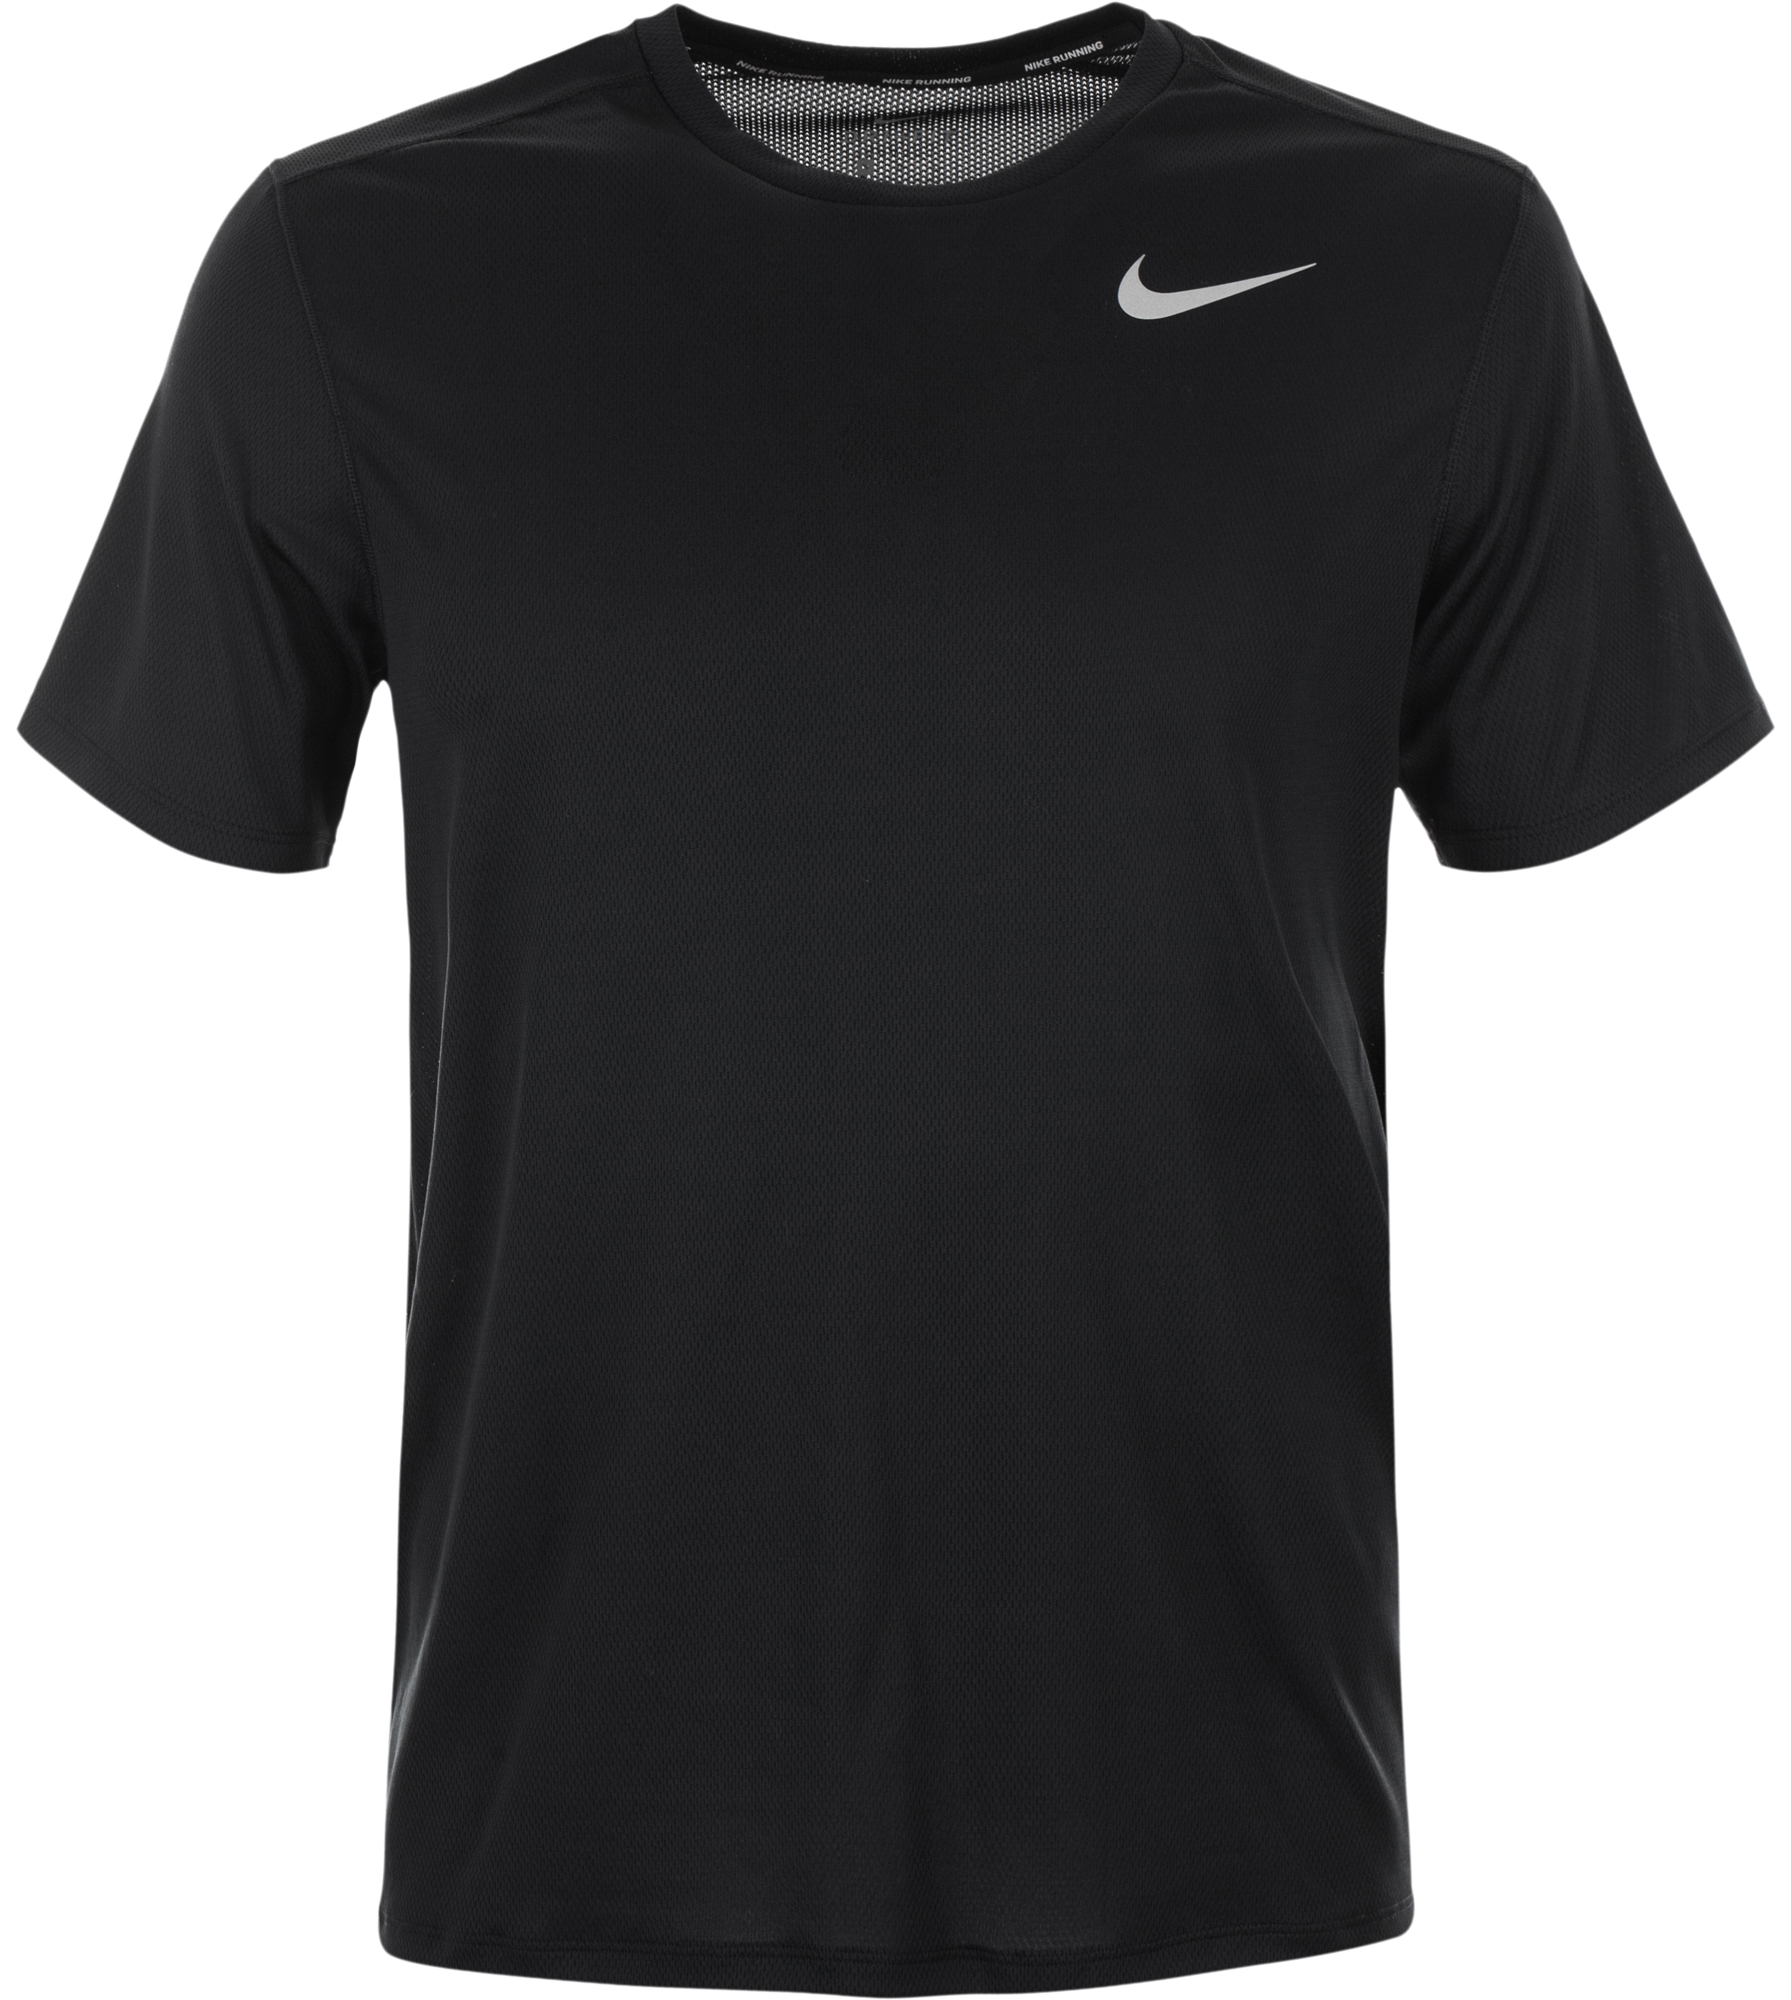 Nike Футболка мужская Nike Breathe, размер 54-56